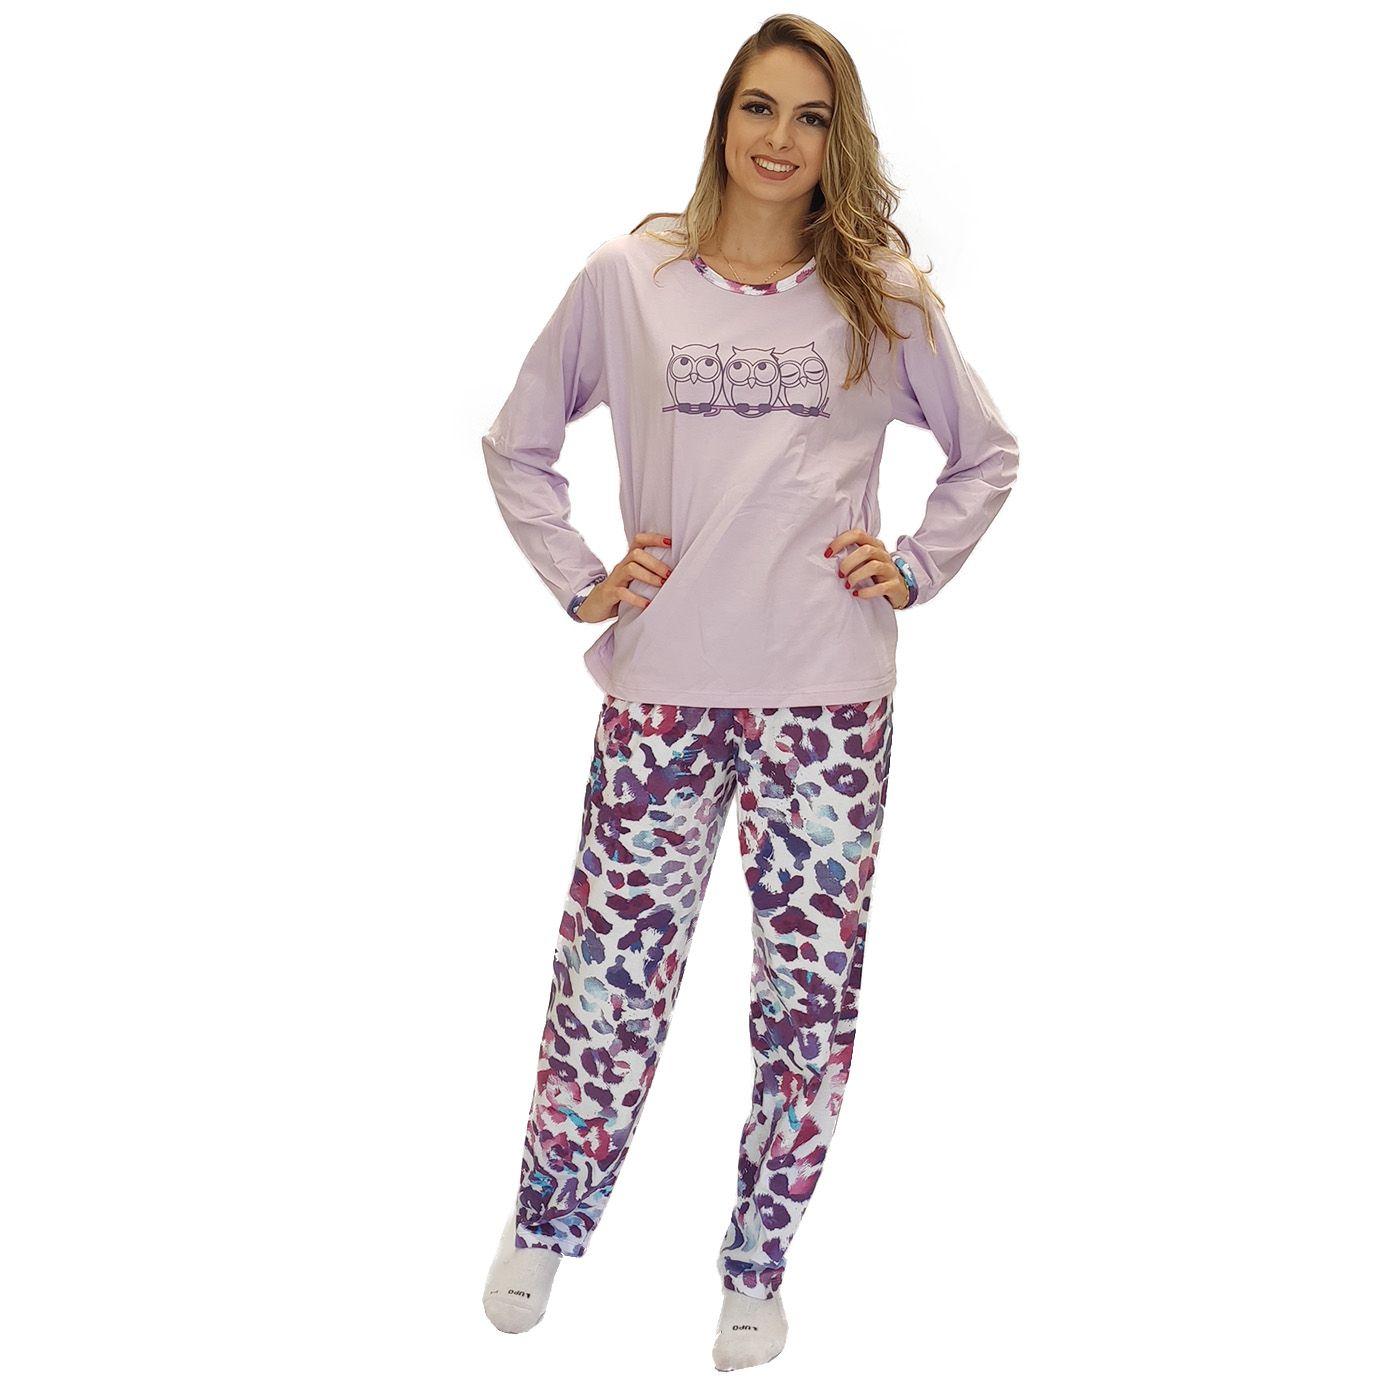 Pijama feminino adulto inverno algodão